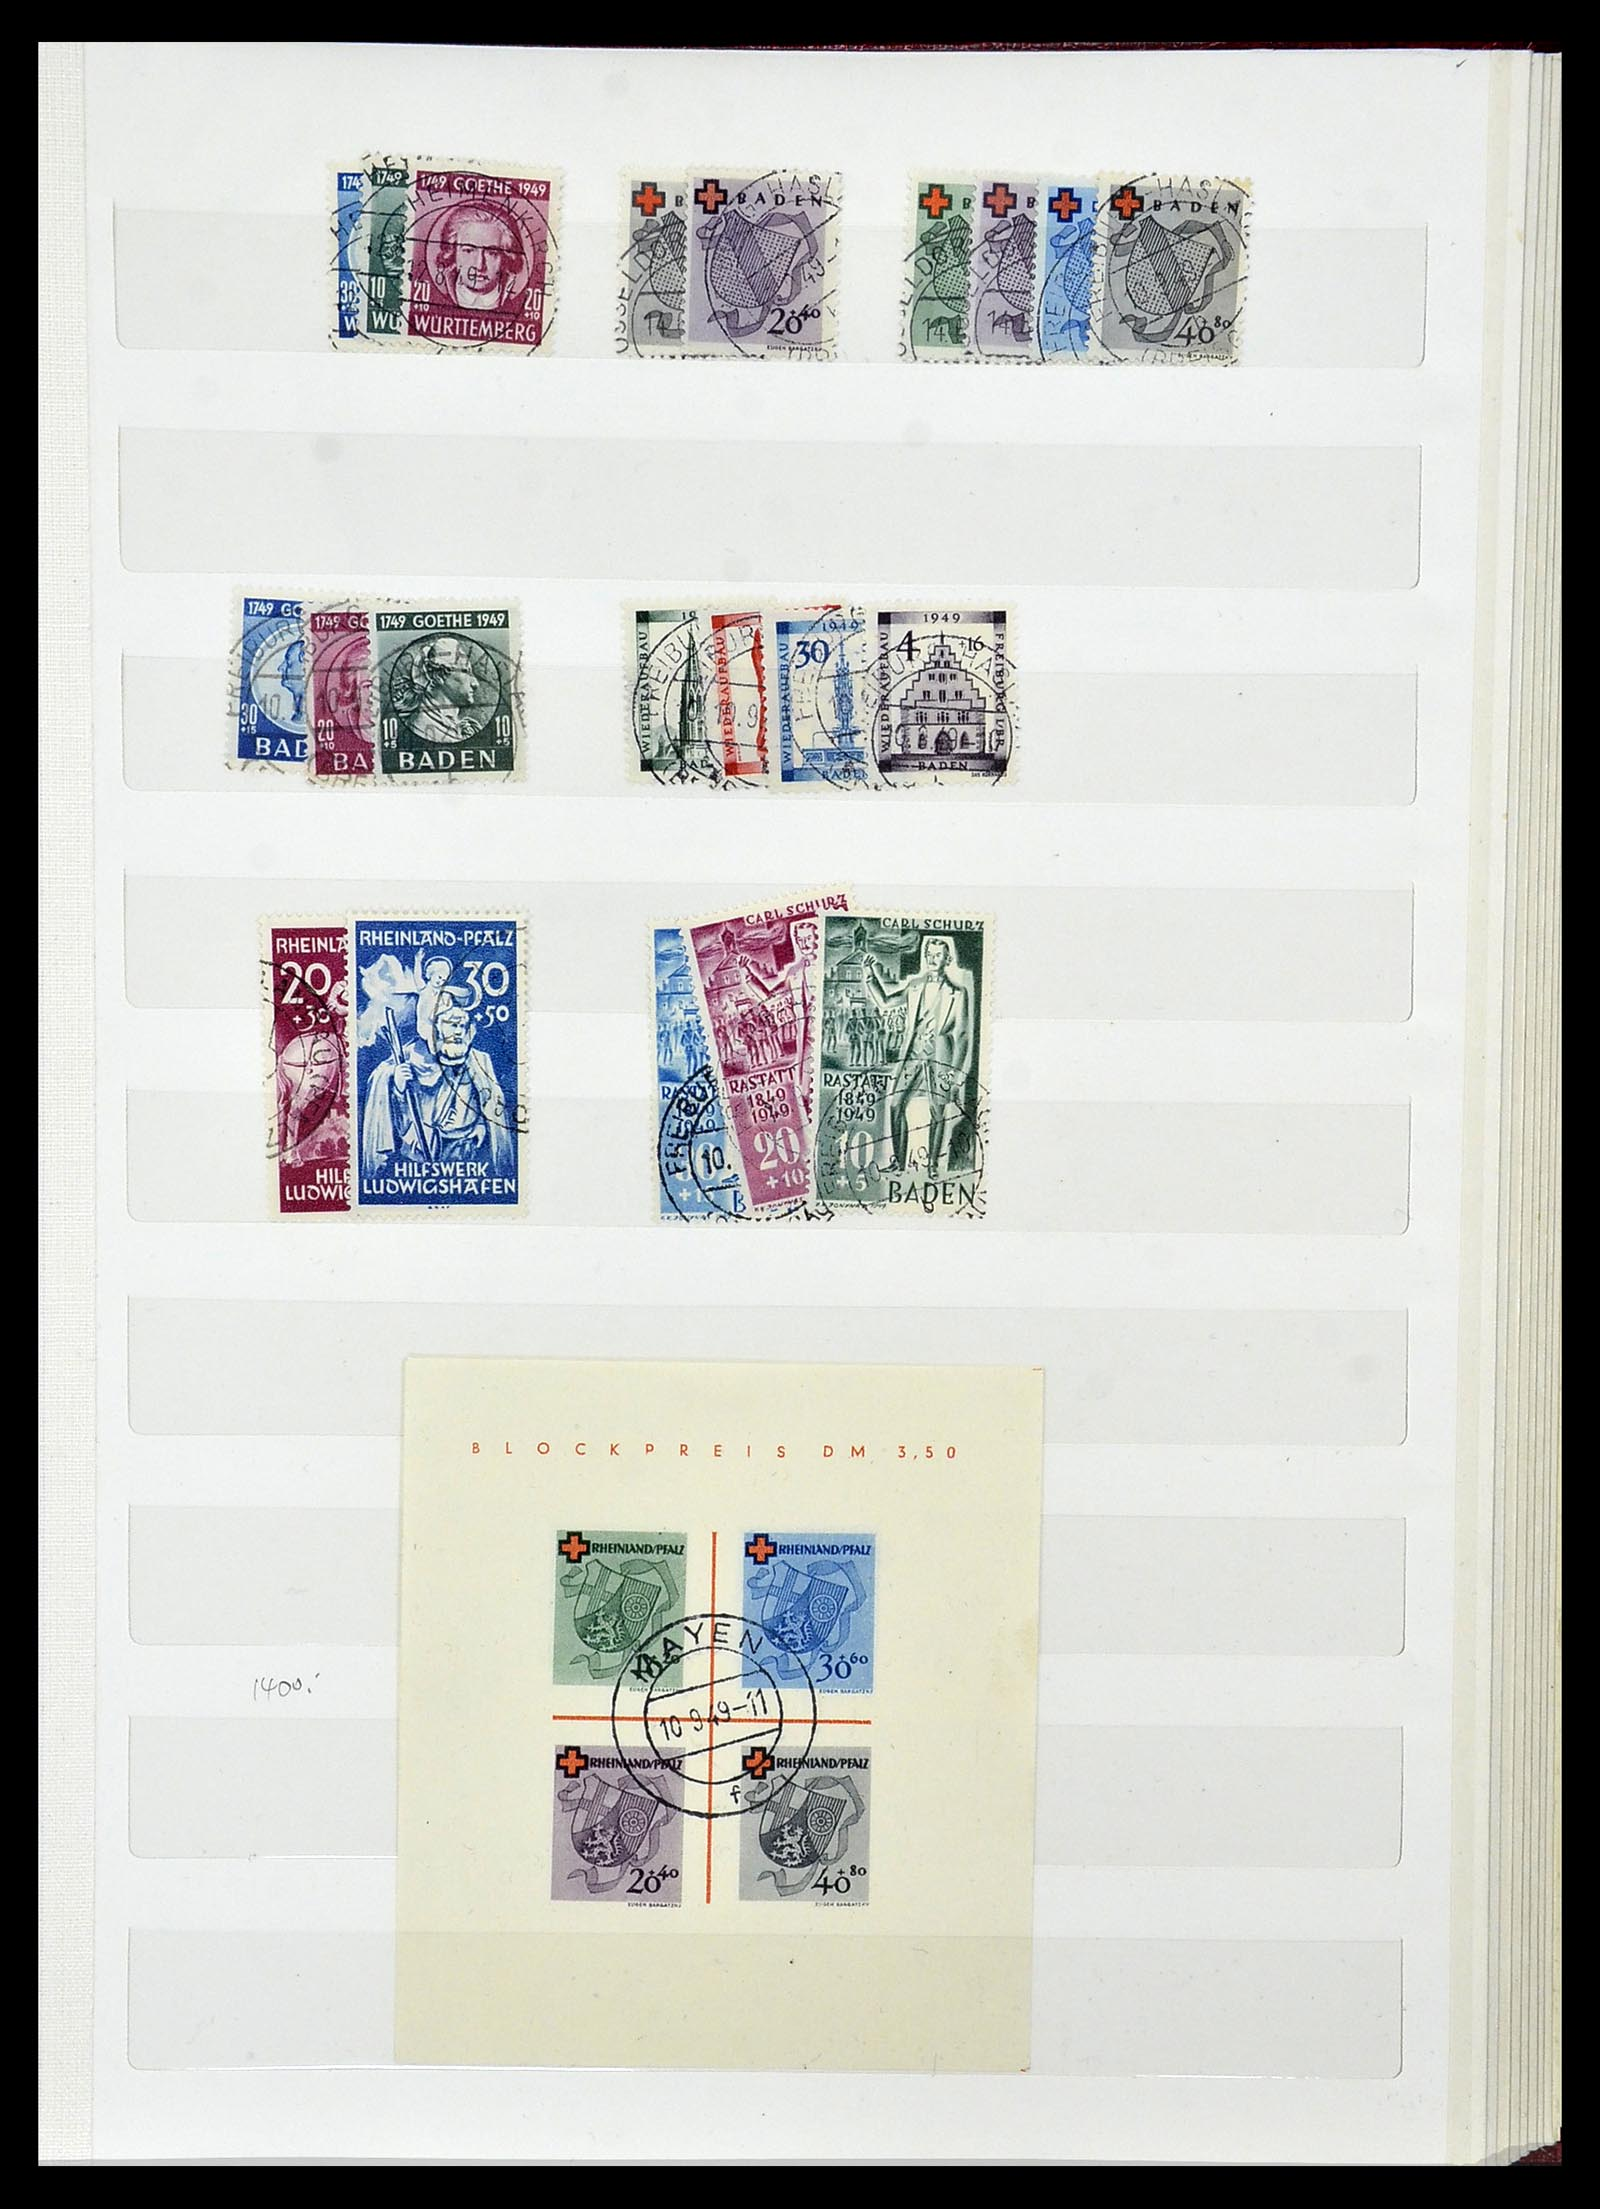 34069 016 - Postzegelverzameling 34069 Duitsland 1855-1952.